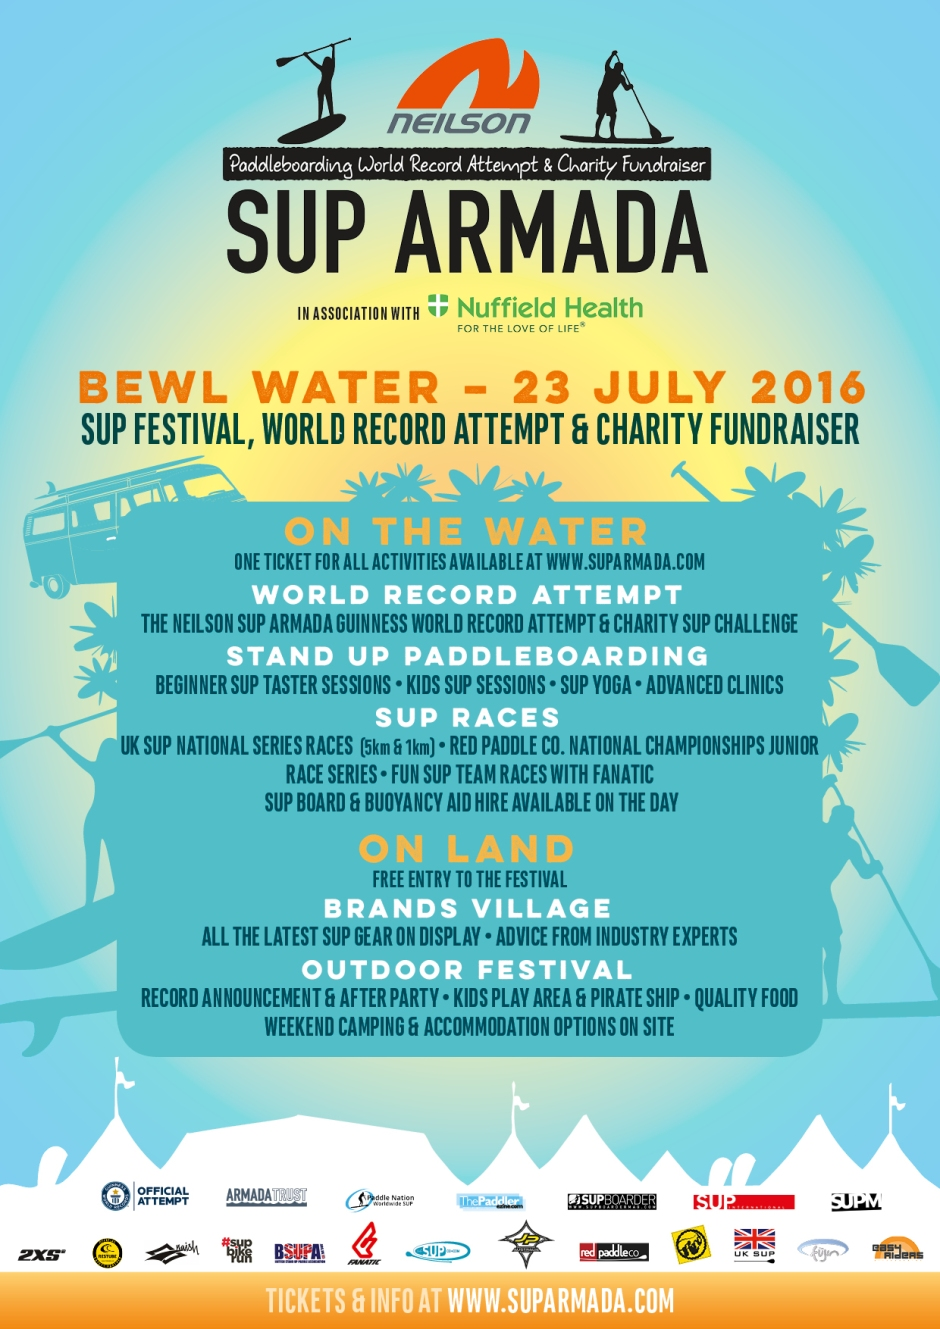 Neilson SUP Armada 2016 Poster (High Res)